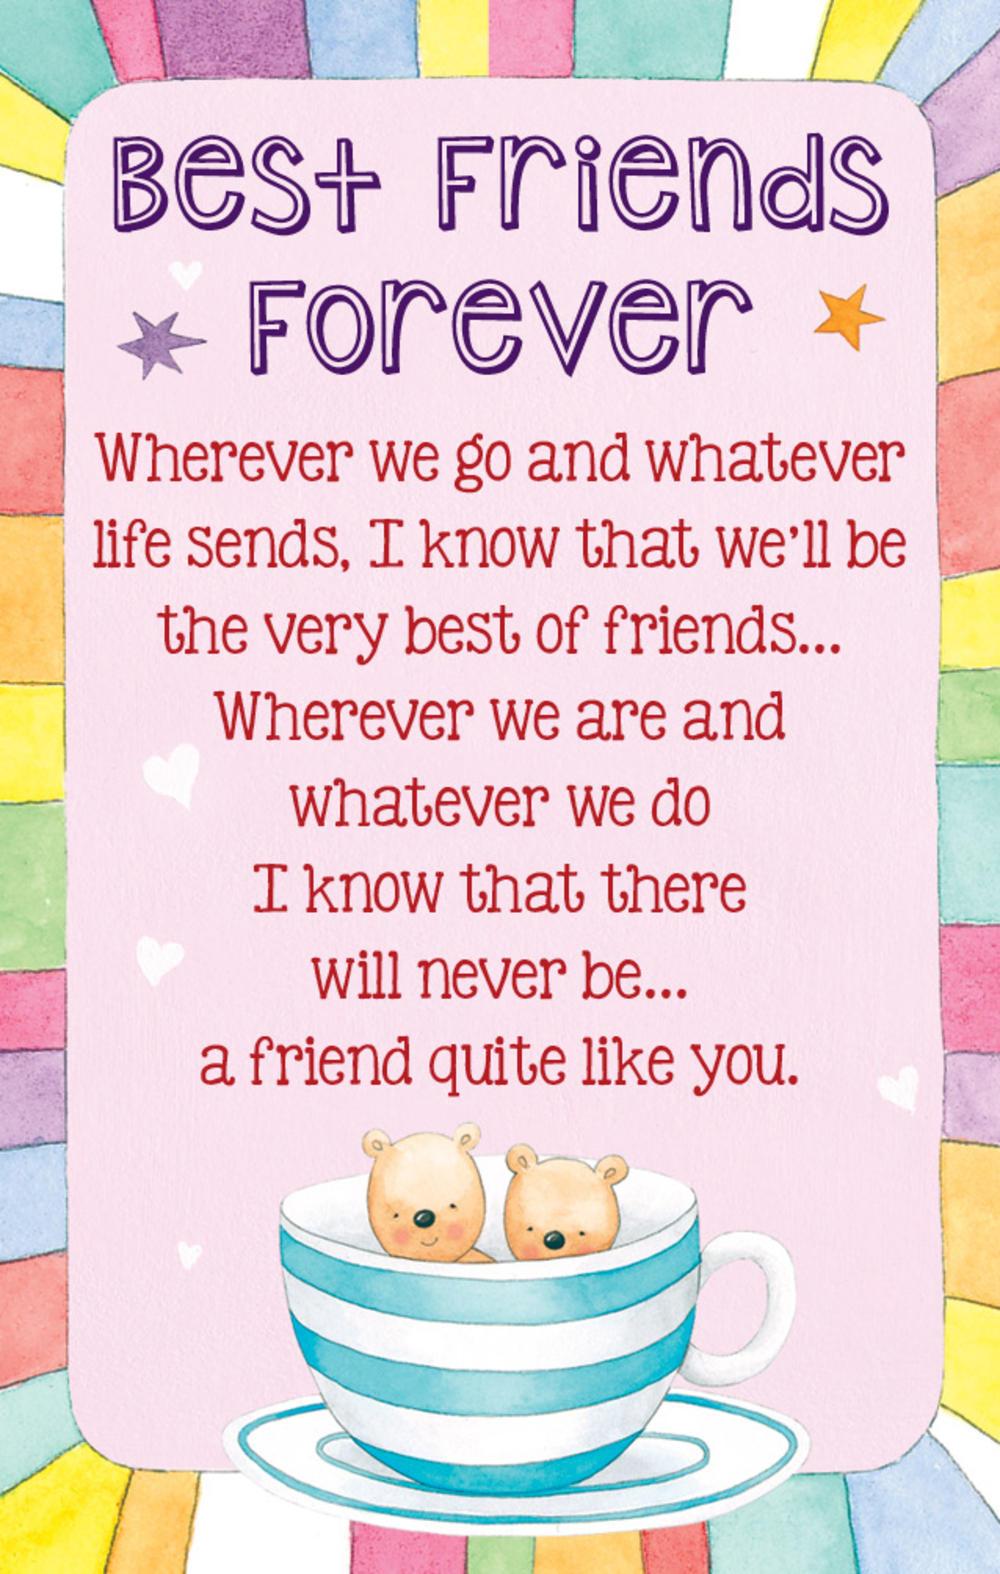 Best Friends Forever Heartwarmers Keepsake Credit Card & Envelope